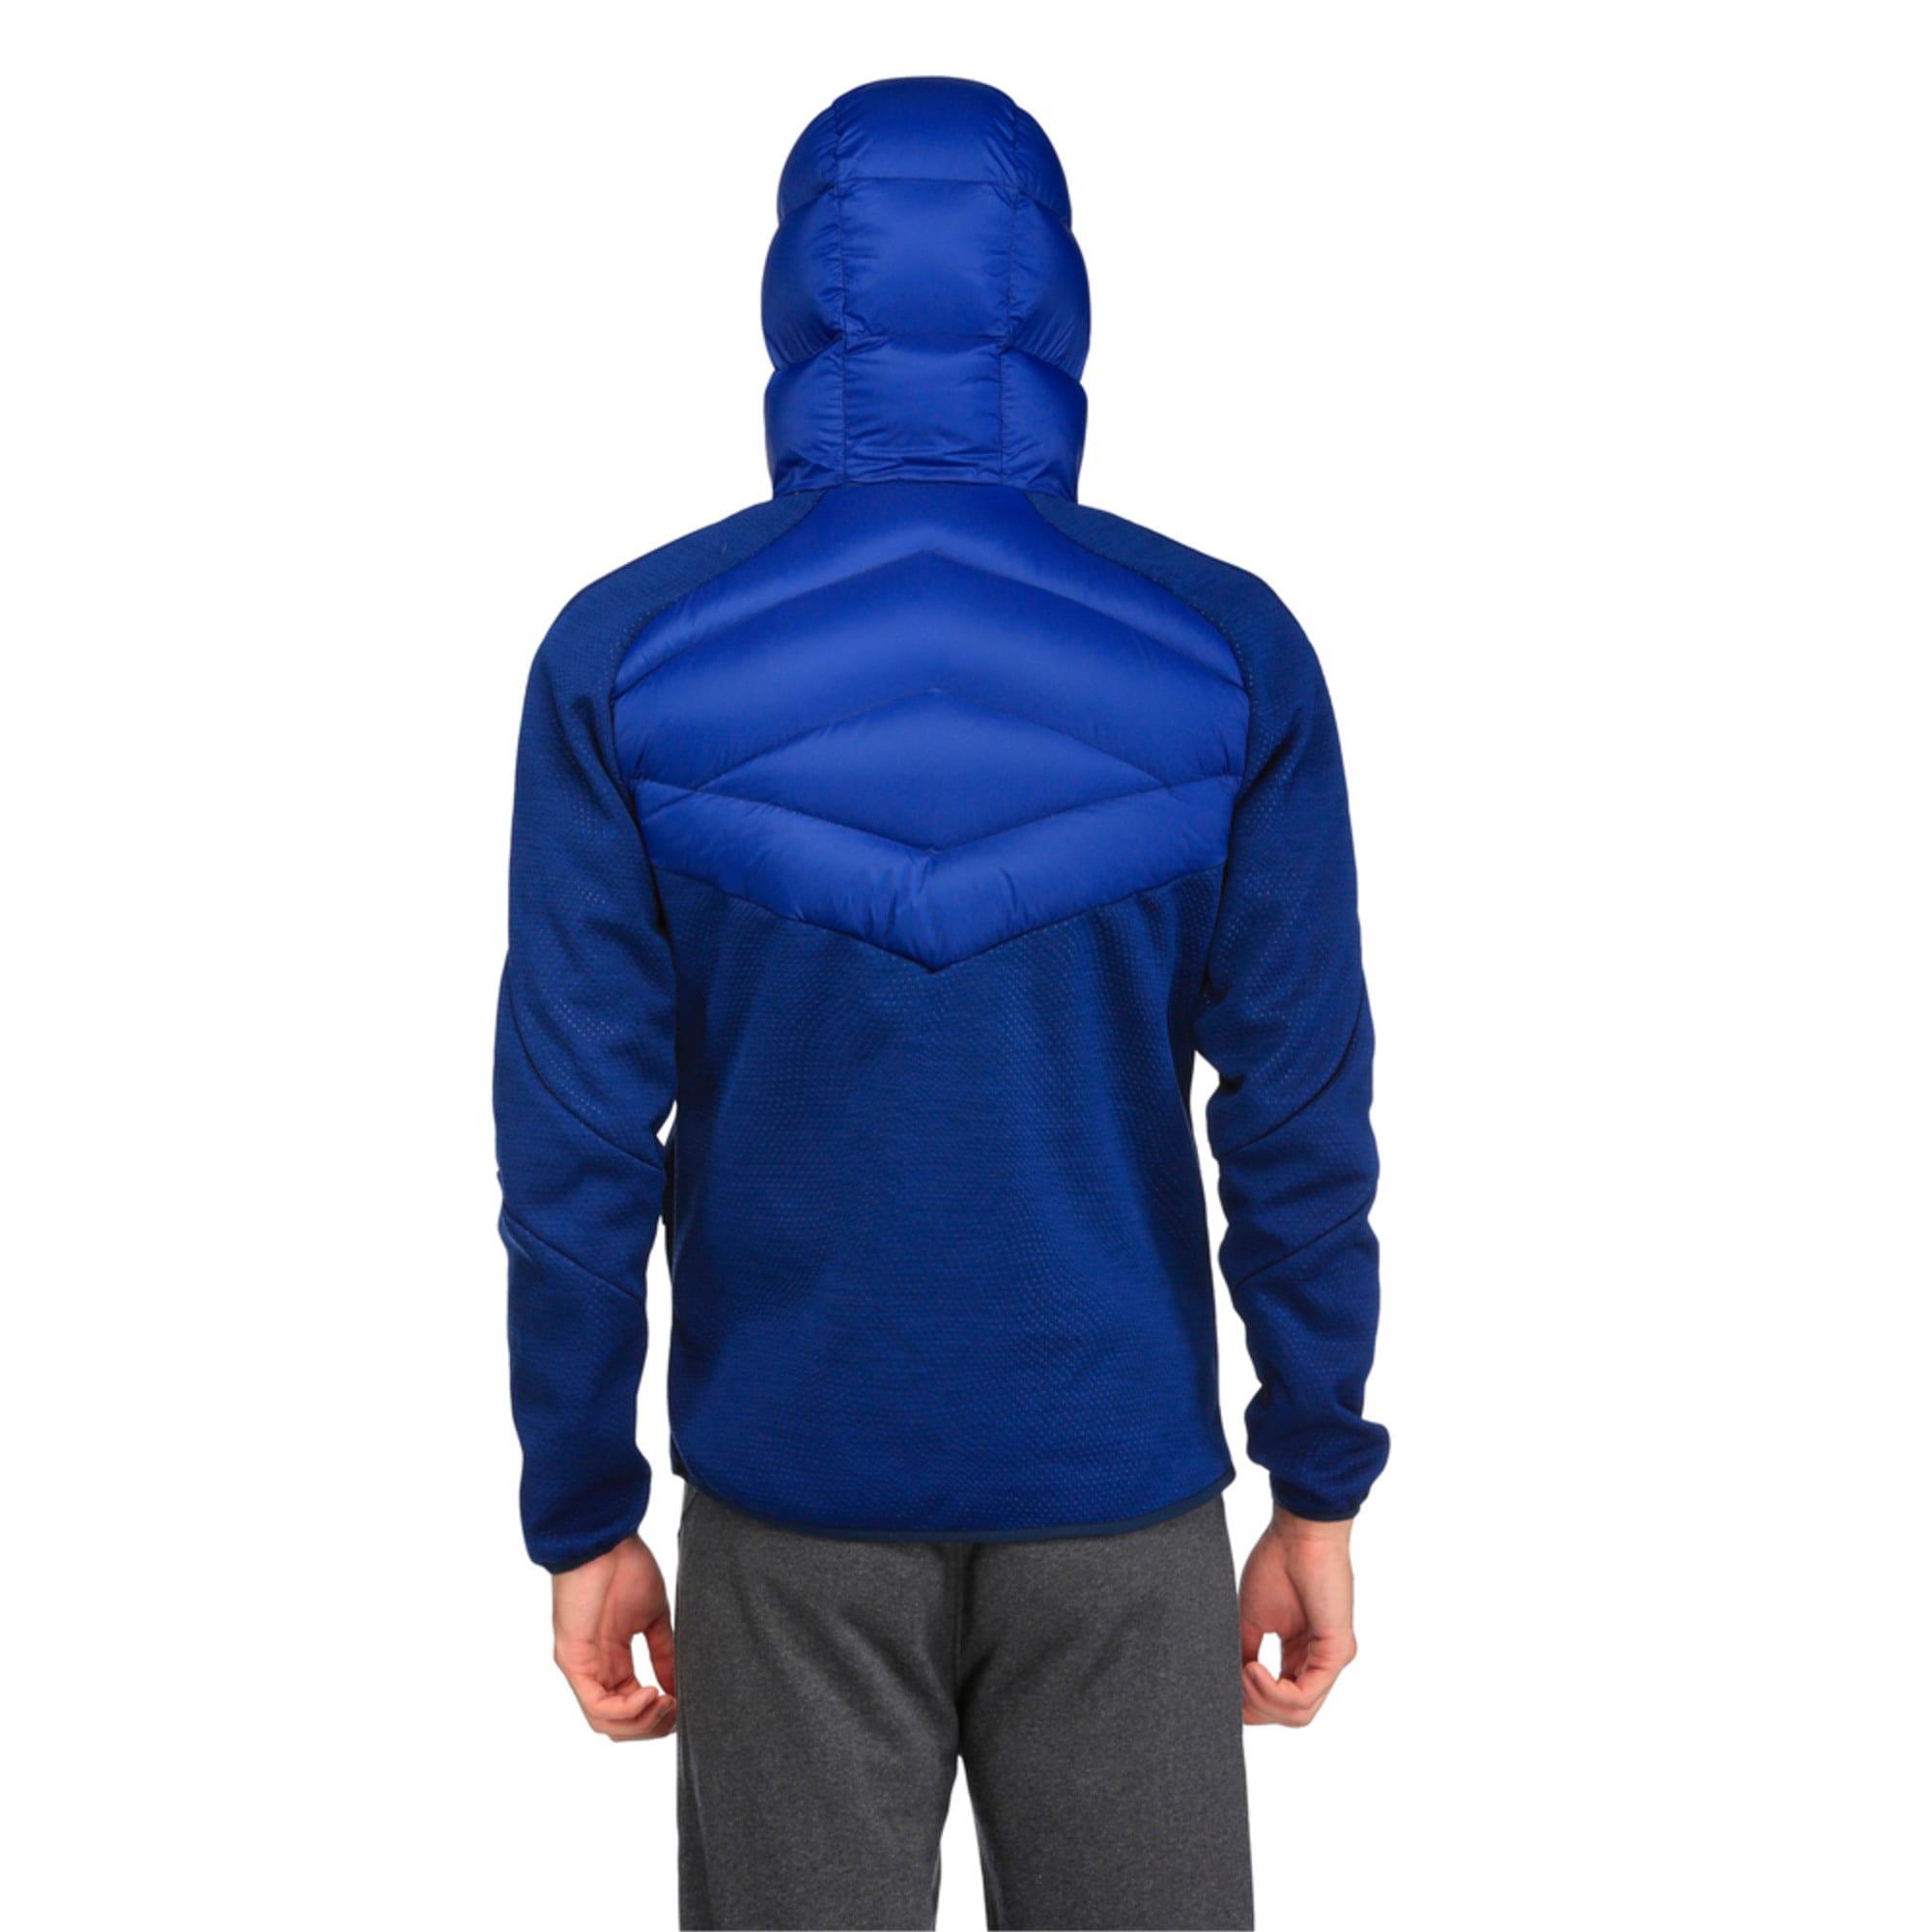 Thumbnail 5 of Double Knit Hybrid 600 Down Men's Jacket, Blue Heather-Blue Depths, medium-IND